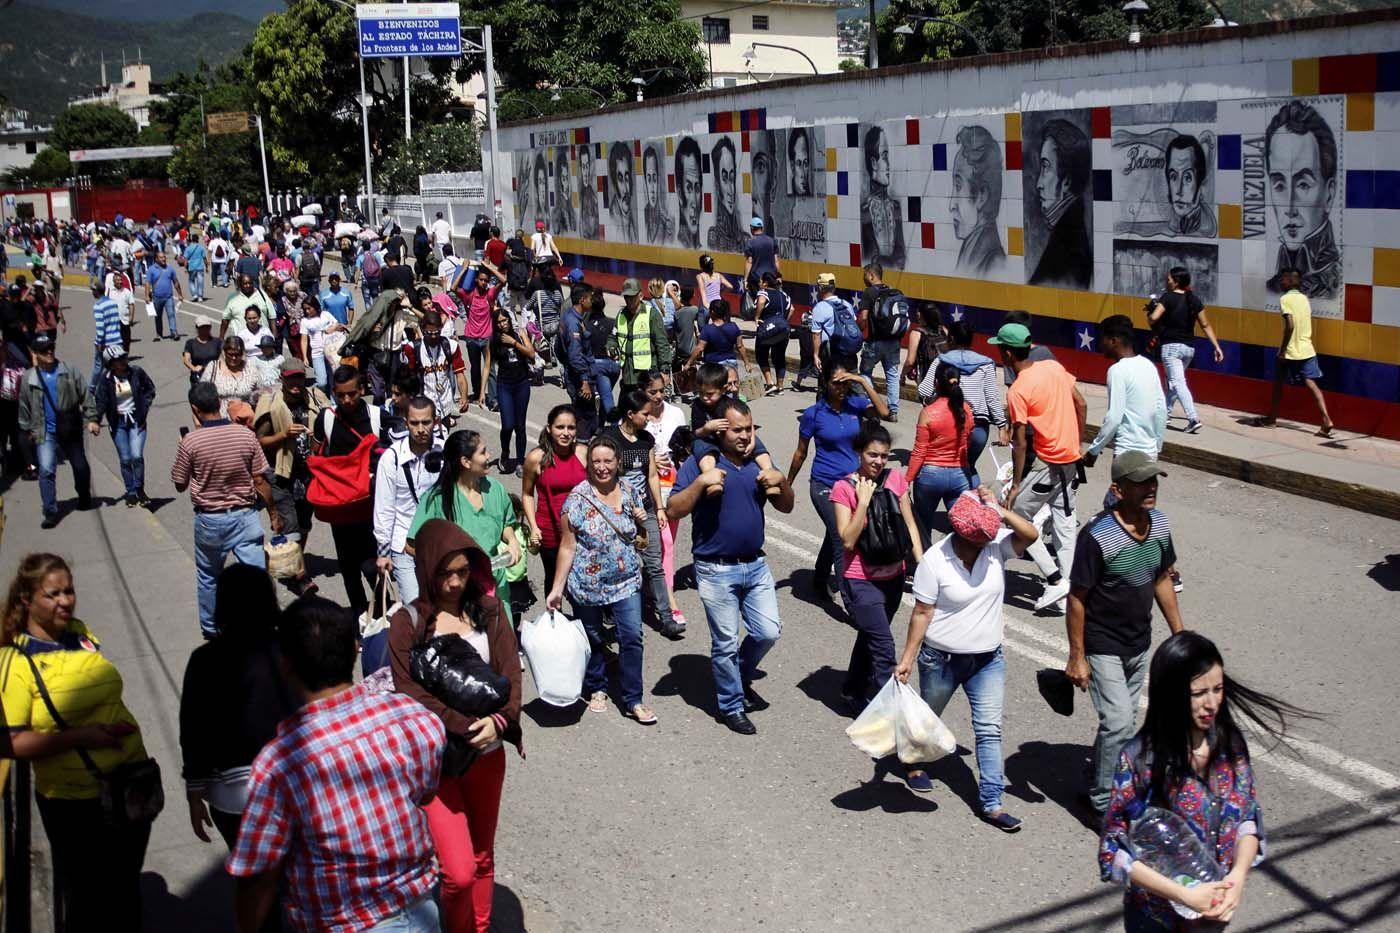 Tag venezuela en El Foro Militar de Venezuela  - Página 6 80af10c7027b9149f3f632ec7e062ce9